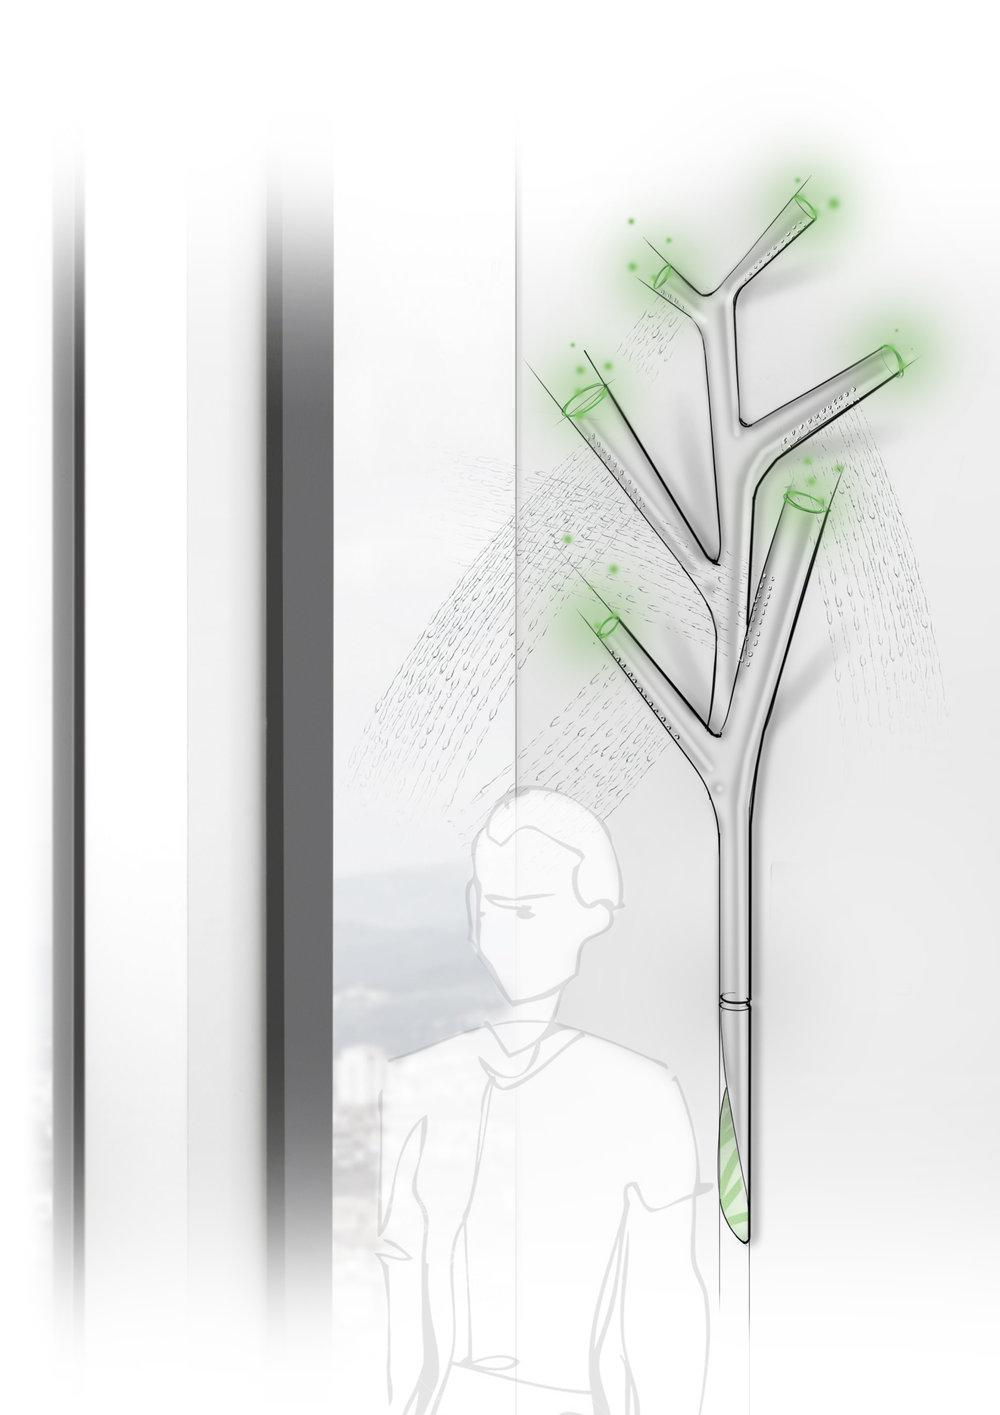 150917_DigitalSketch_Concept2.jpg